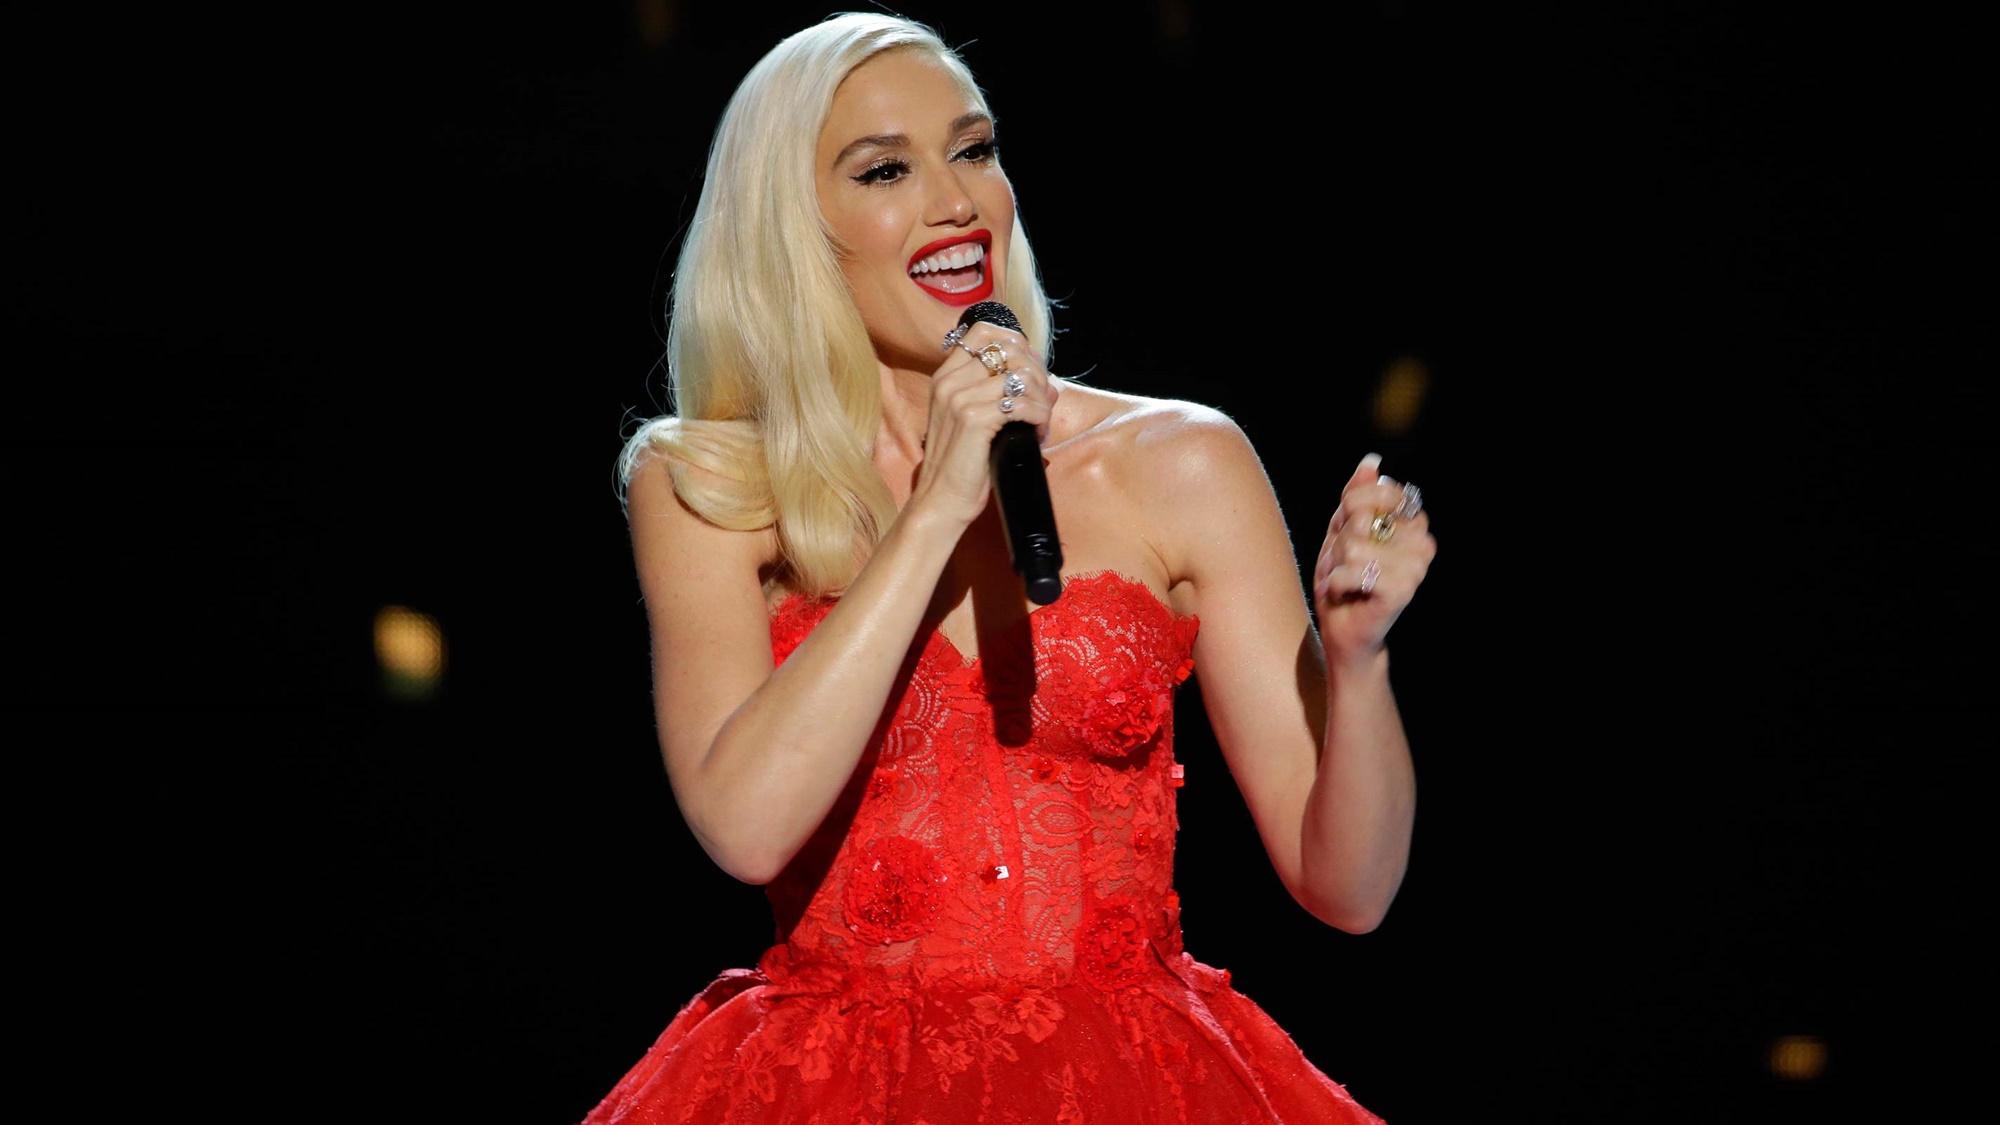 Gwen Stefani Blake Shelton Valentine's Day